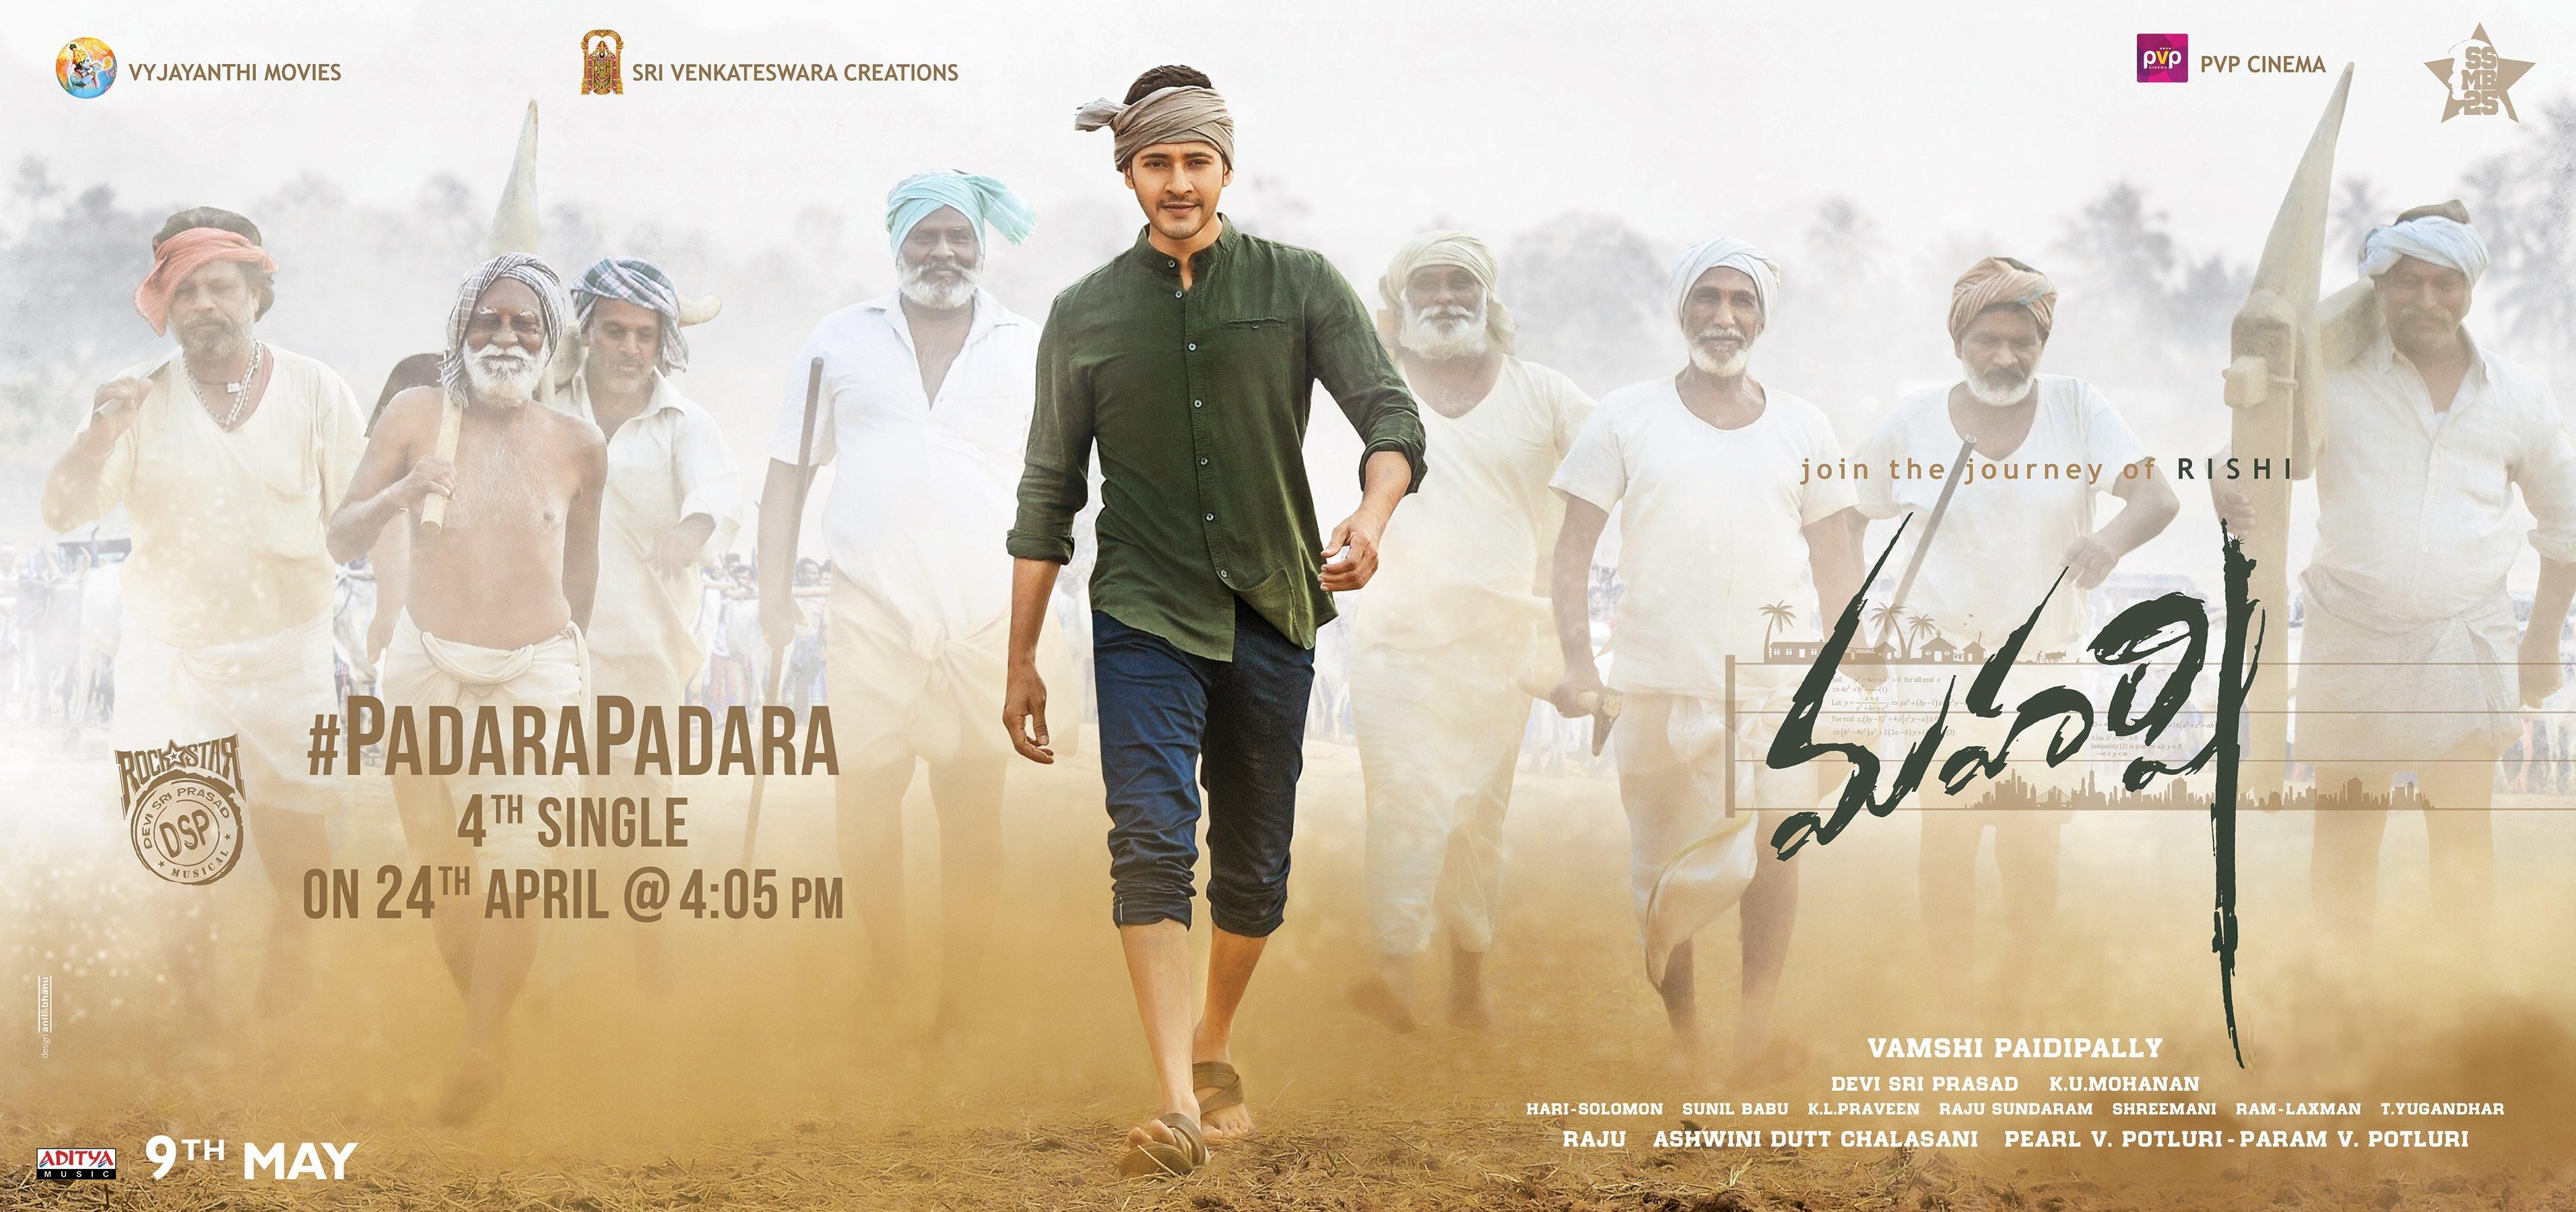 Maharshi Movie 4th Single Padara Padara Song Release Poster HD